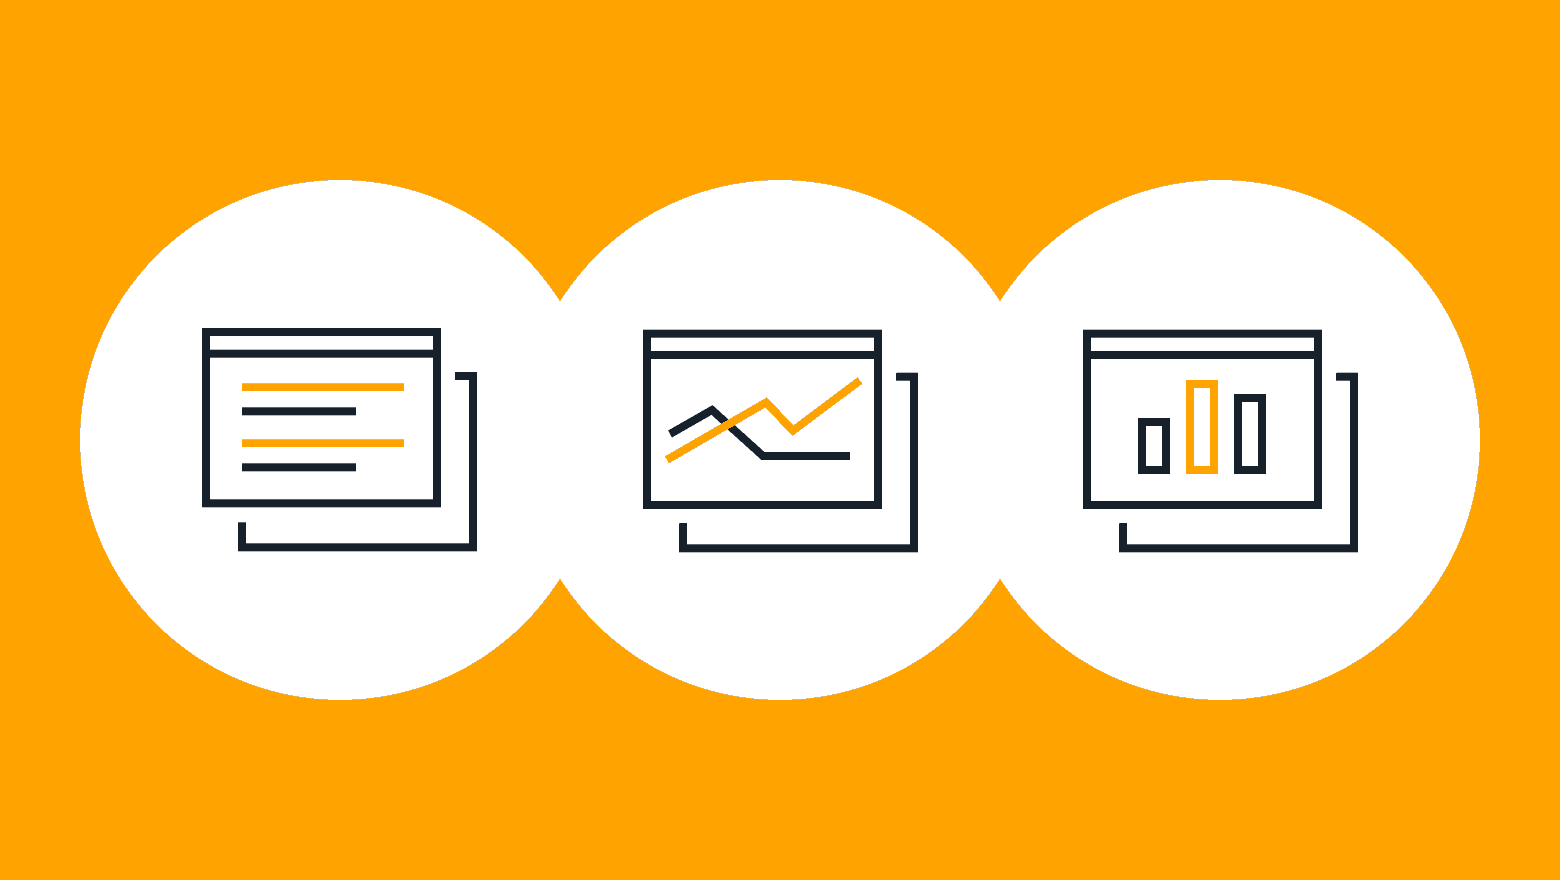 seo competitor analysis tools icon